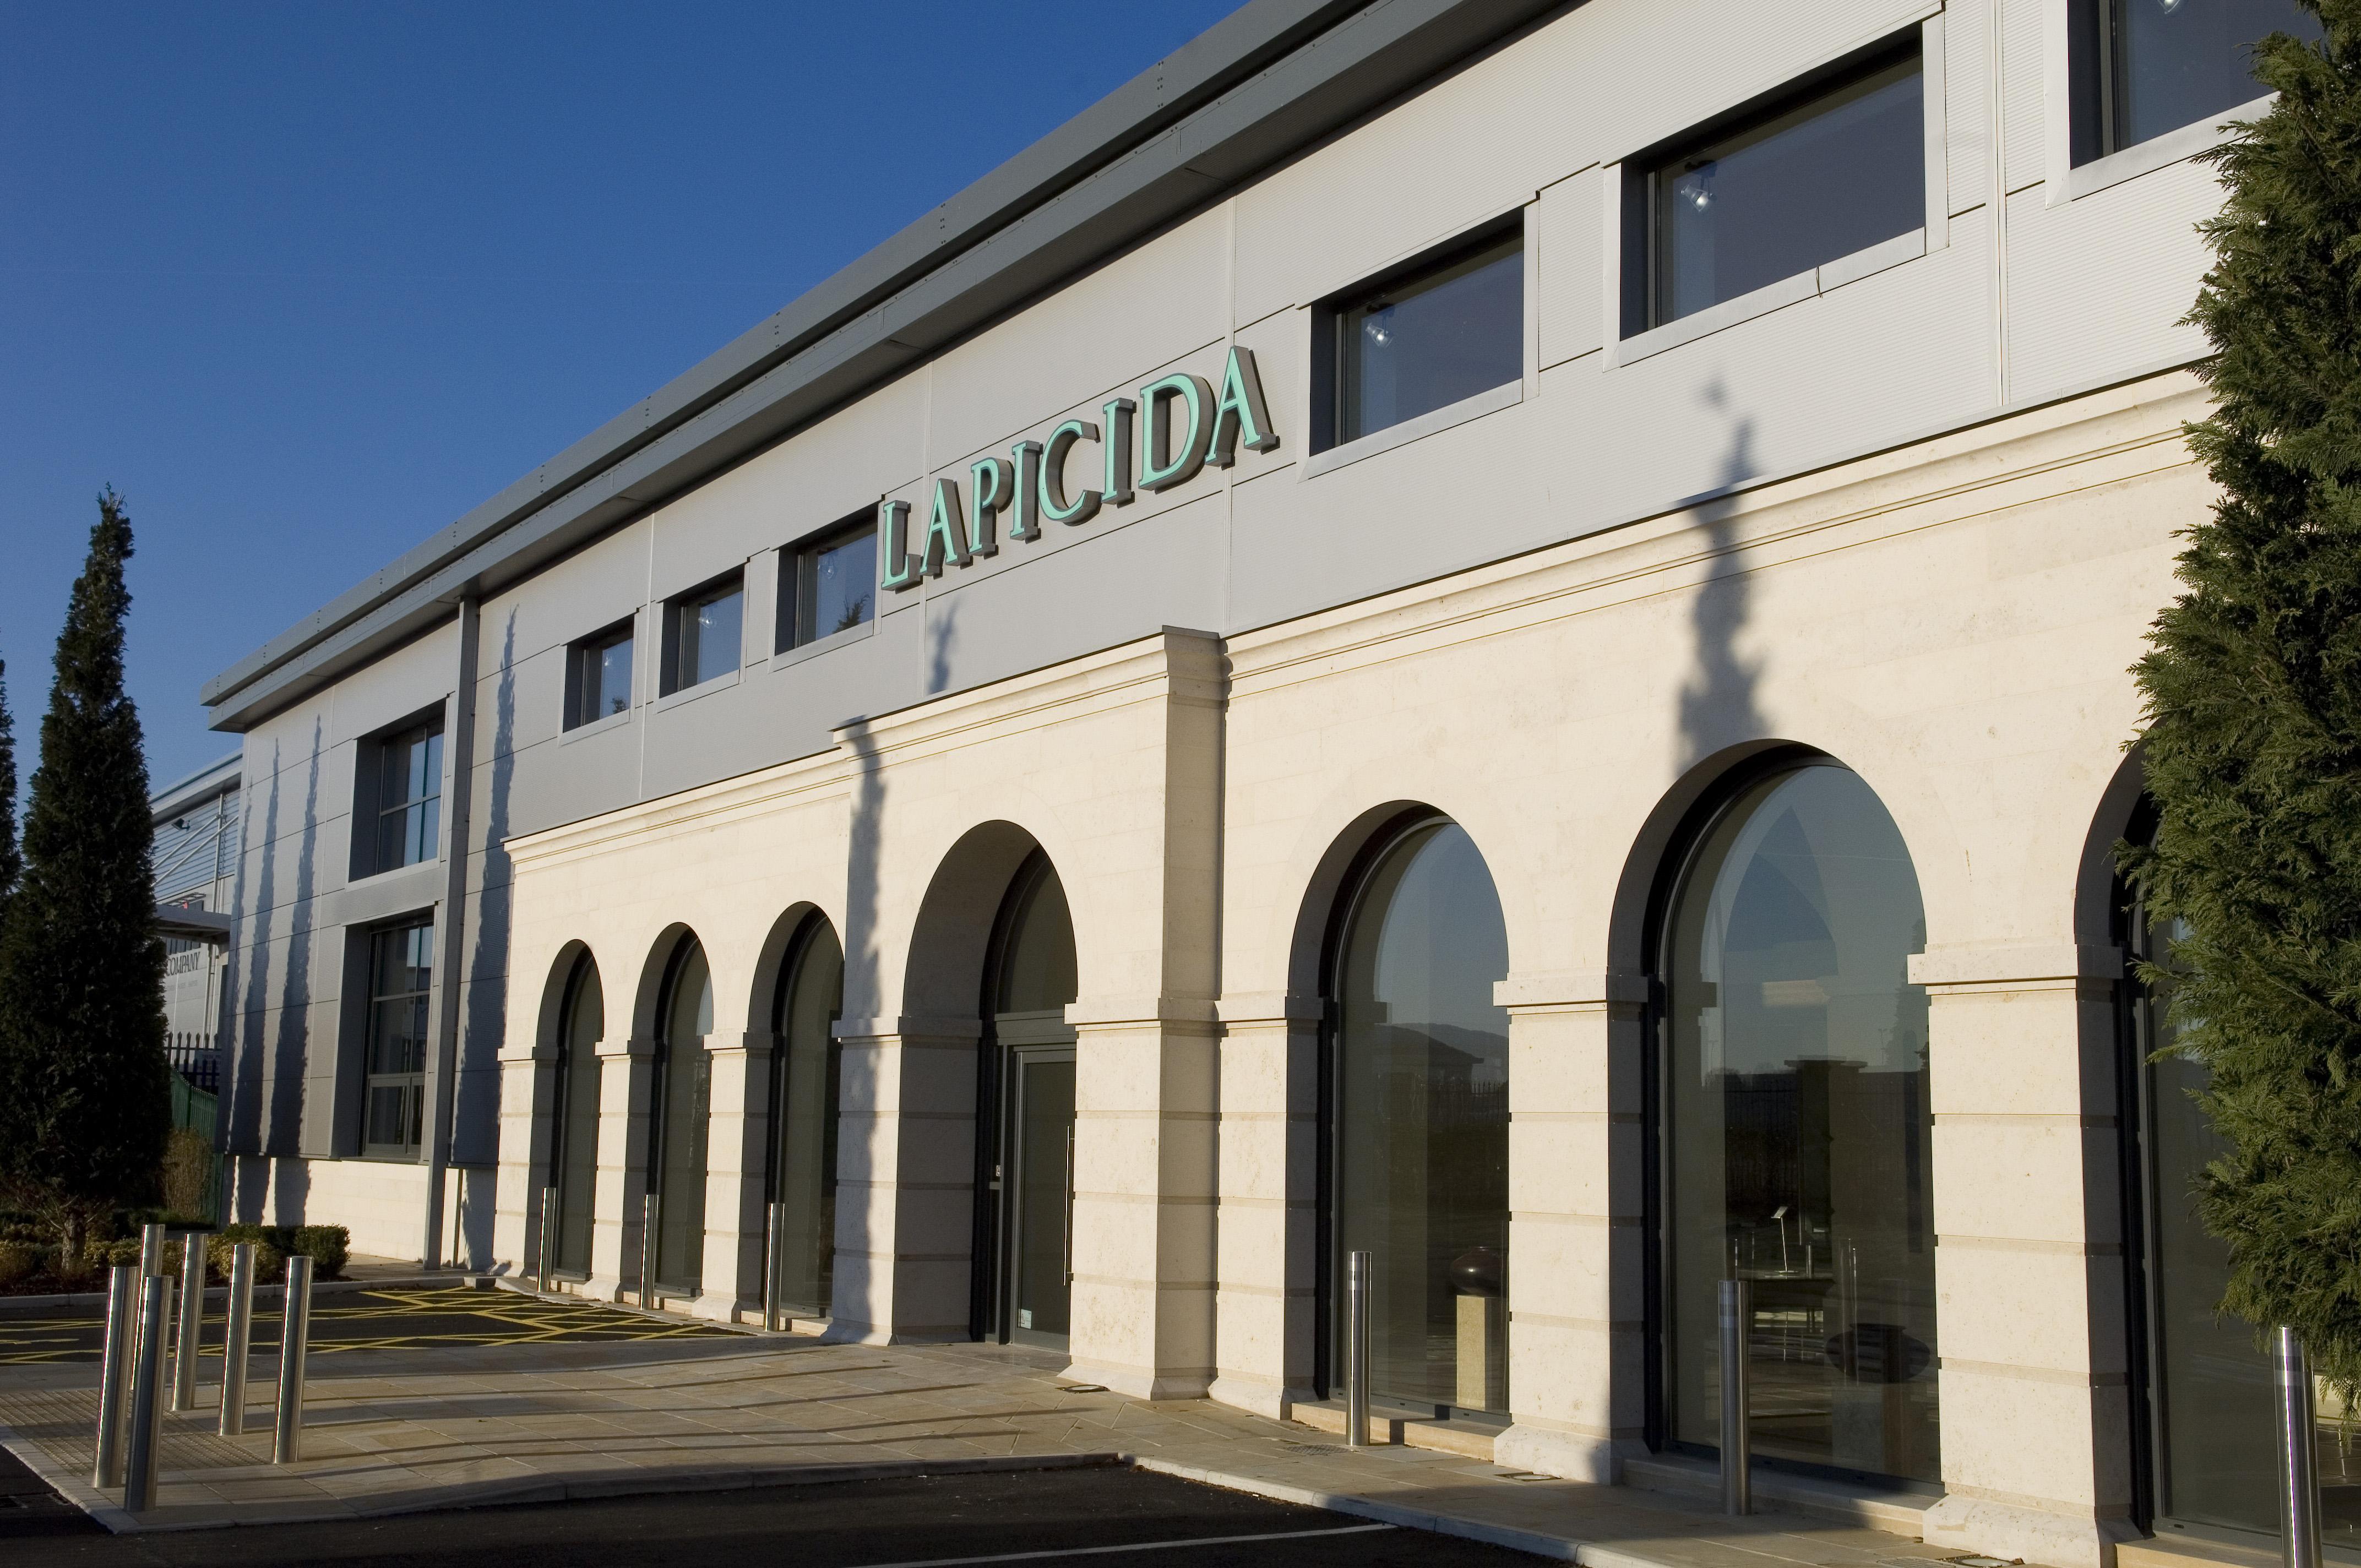 Lapicida_Harrogate-Showroom_First-day-HR (11)